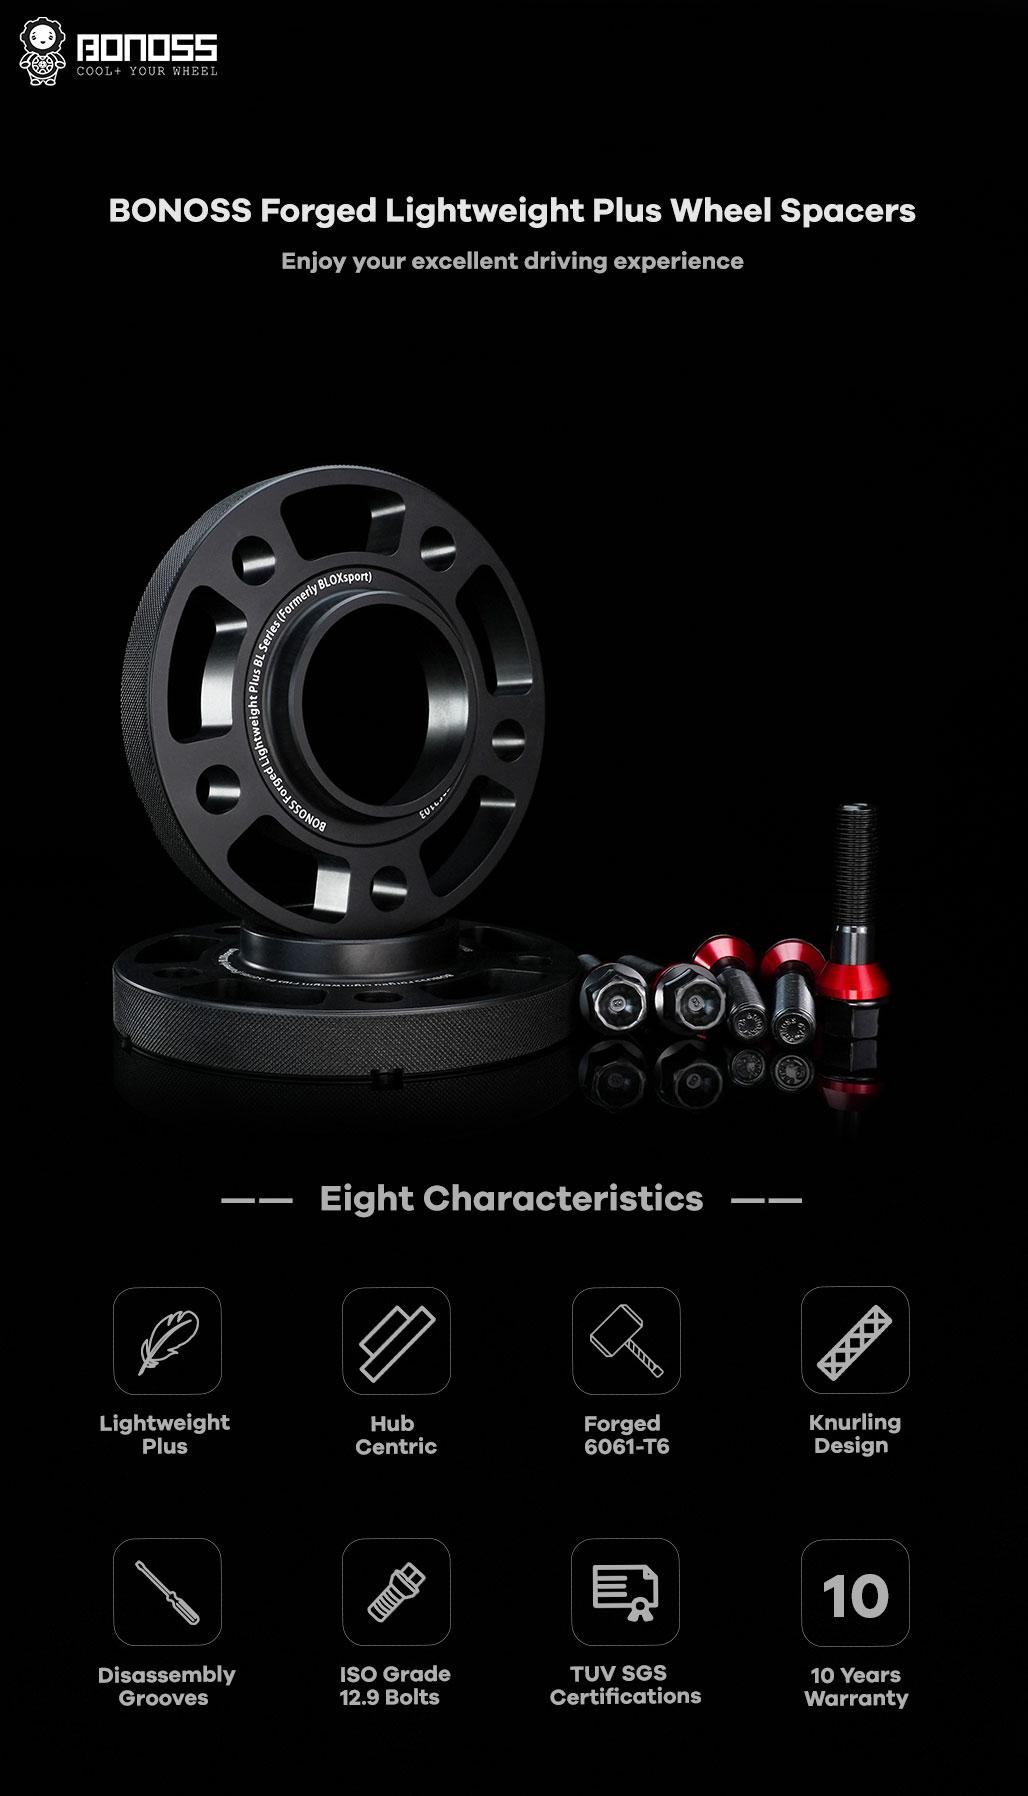 BONOSS-forged-lightweight-plus-wheel-spacer-for-Opel-Vivaro-A-5x118-71-14x1.5-6061t6-by-grace-1